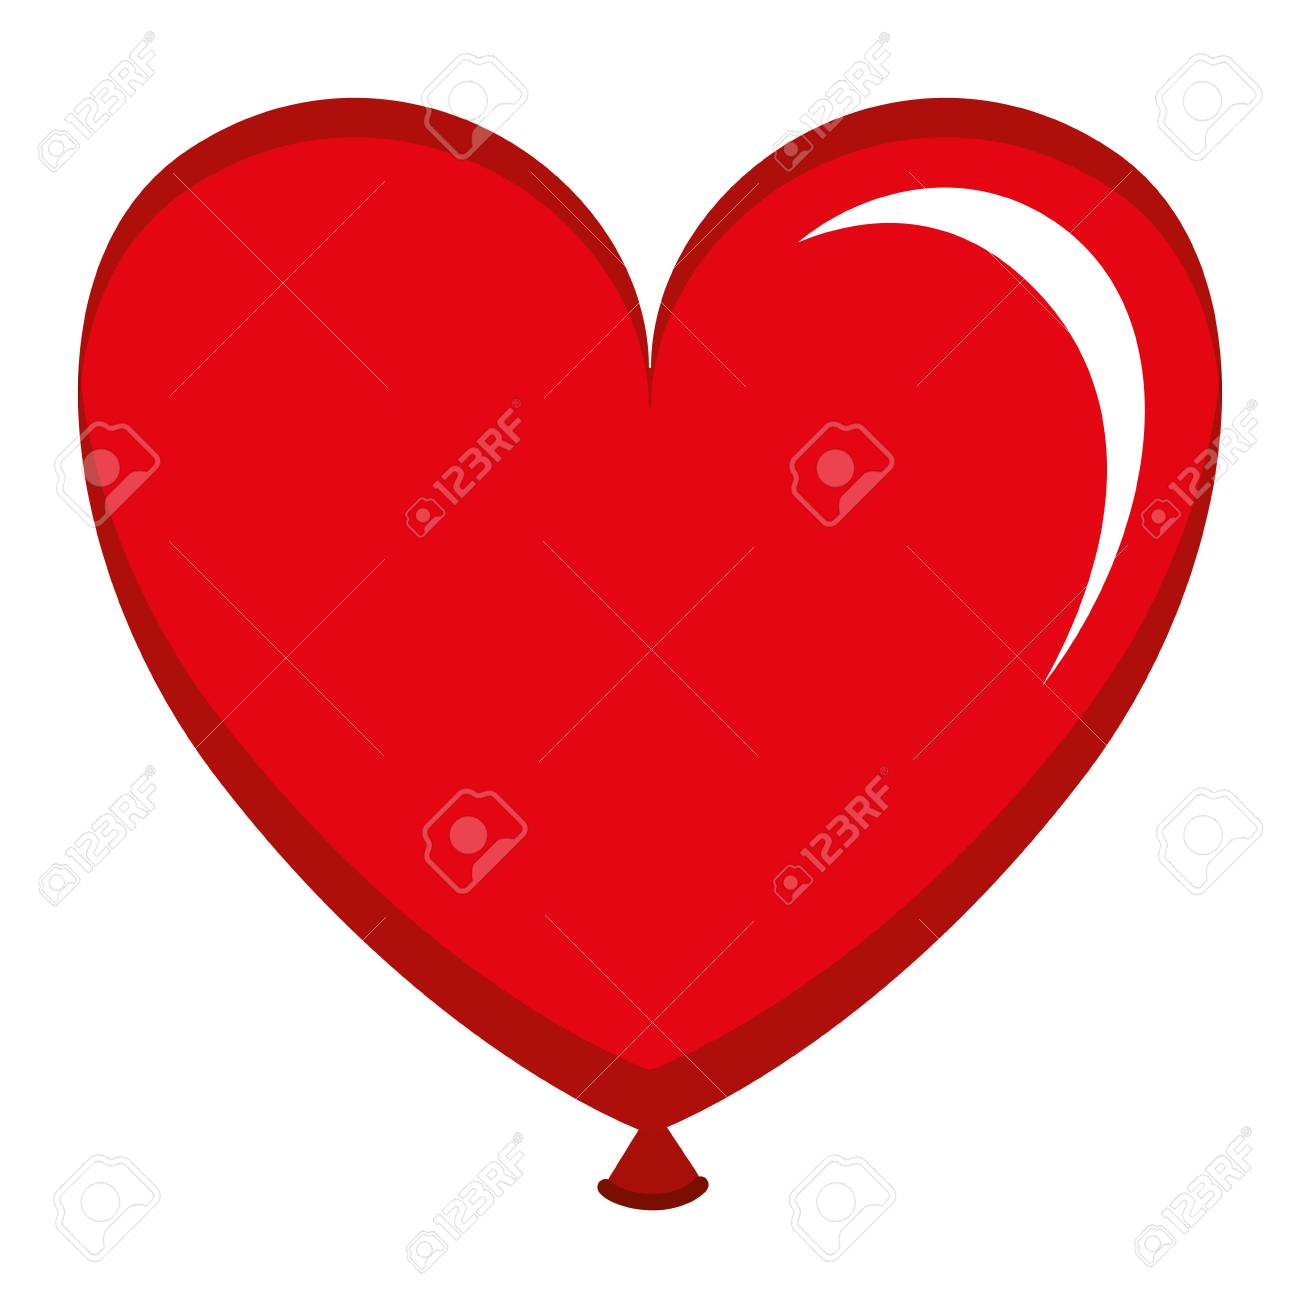 balloon air with heart shape vector illustration design royalty free rh 123rf com heart shape vector free heart shaped vector free